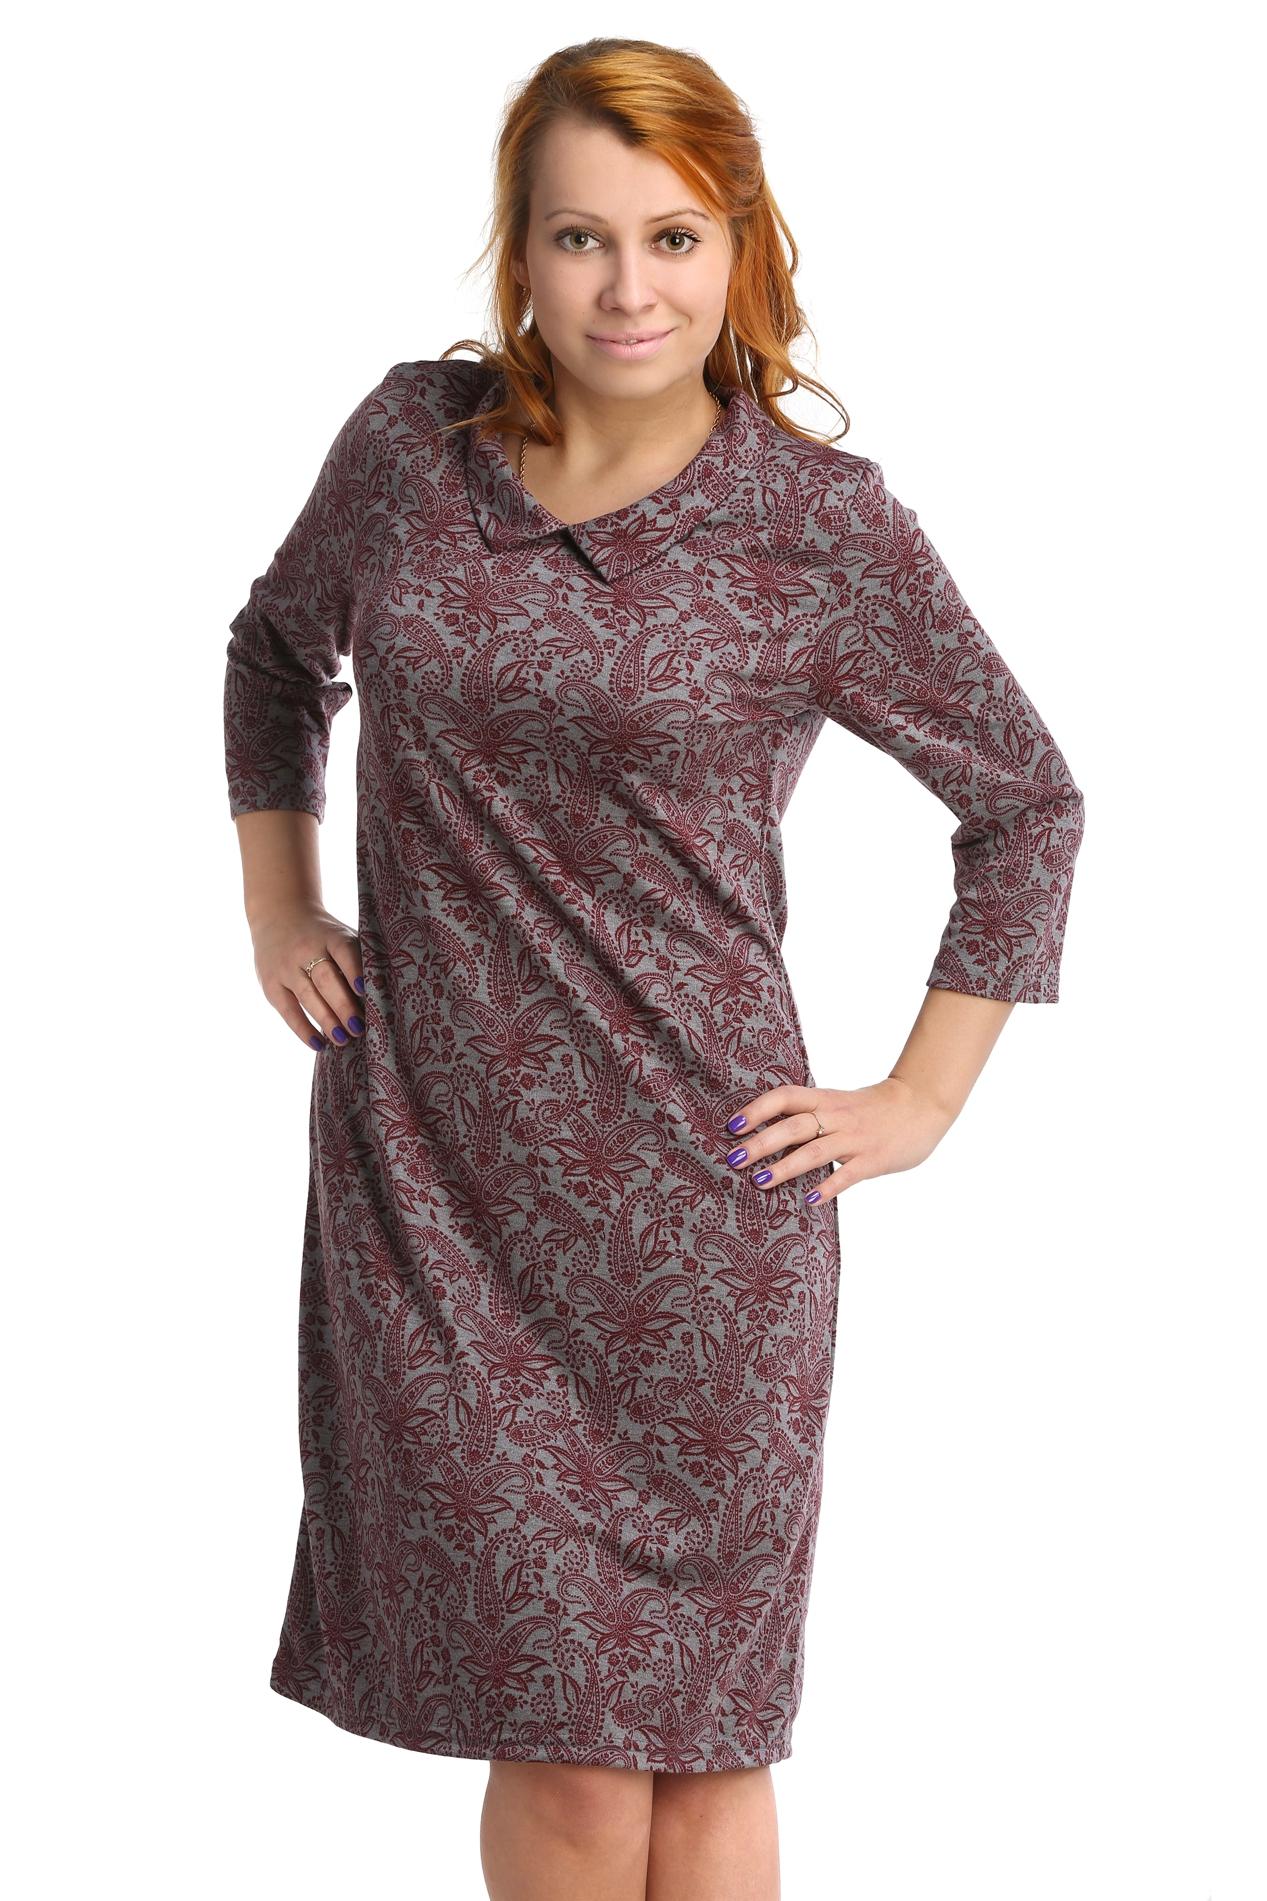 Жен. платье арт. 16-0073 Бордо р. 52Платья<br>Обхват груди:104 см<br>Обхват талии:86 см<br>Обхват бедер:112 см<br>Длина по спинке:99 см<br>Рост:164-170 см<br><br>Тип: Жен. платье<br>Размер: 52<br>Материал: Интерлок